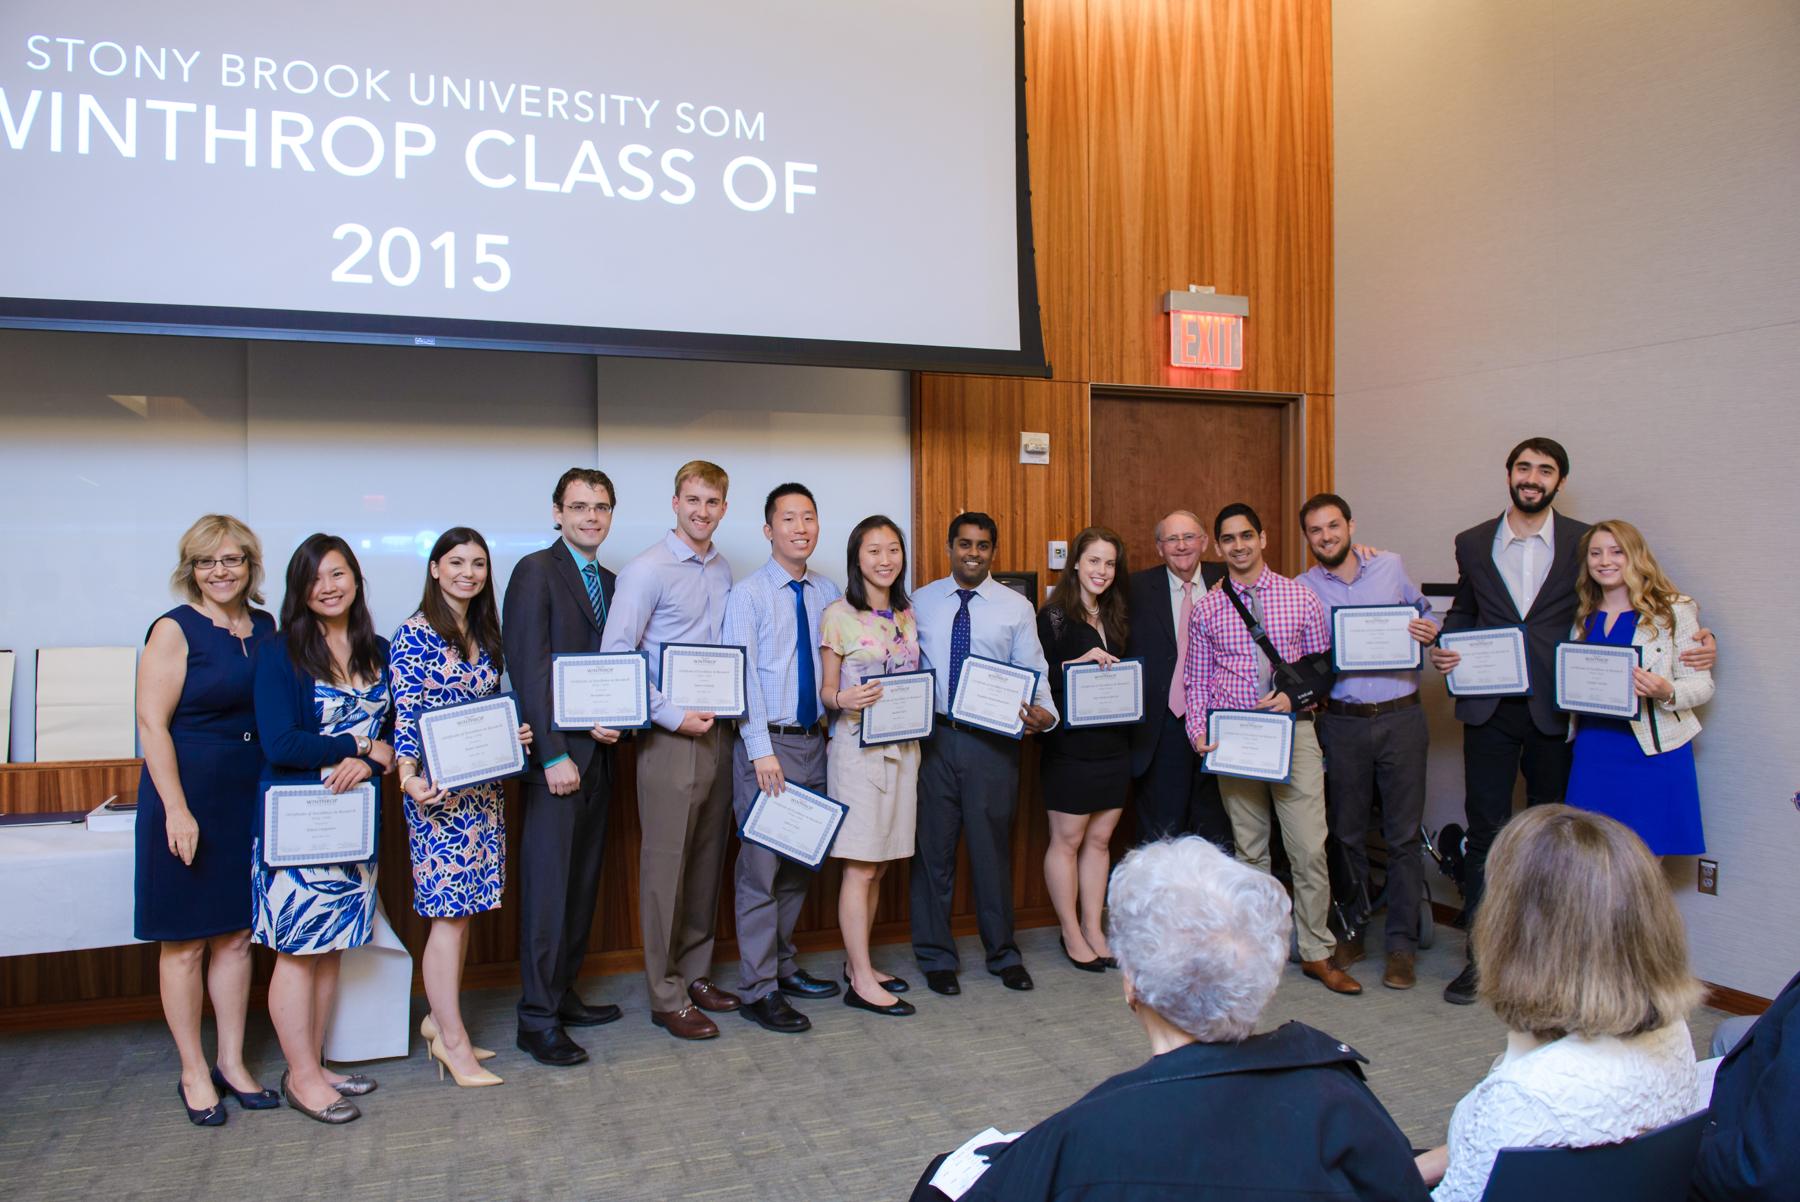 Winthrop_Graduation-58.jpg